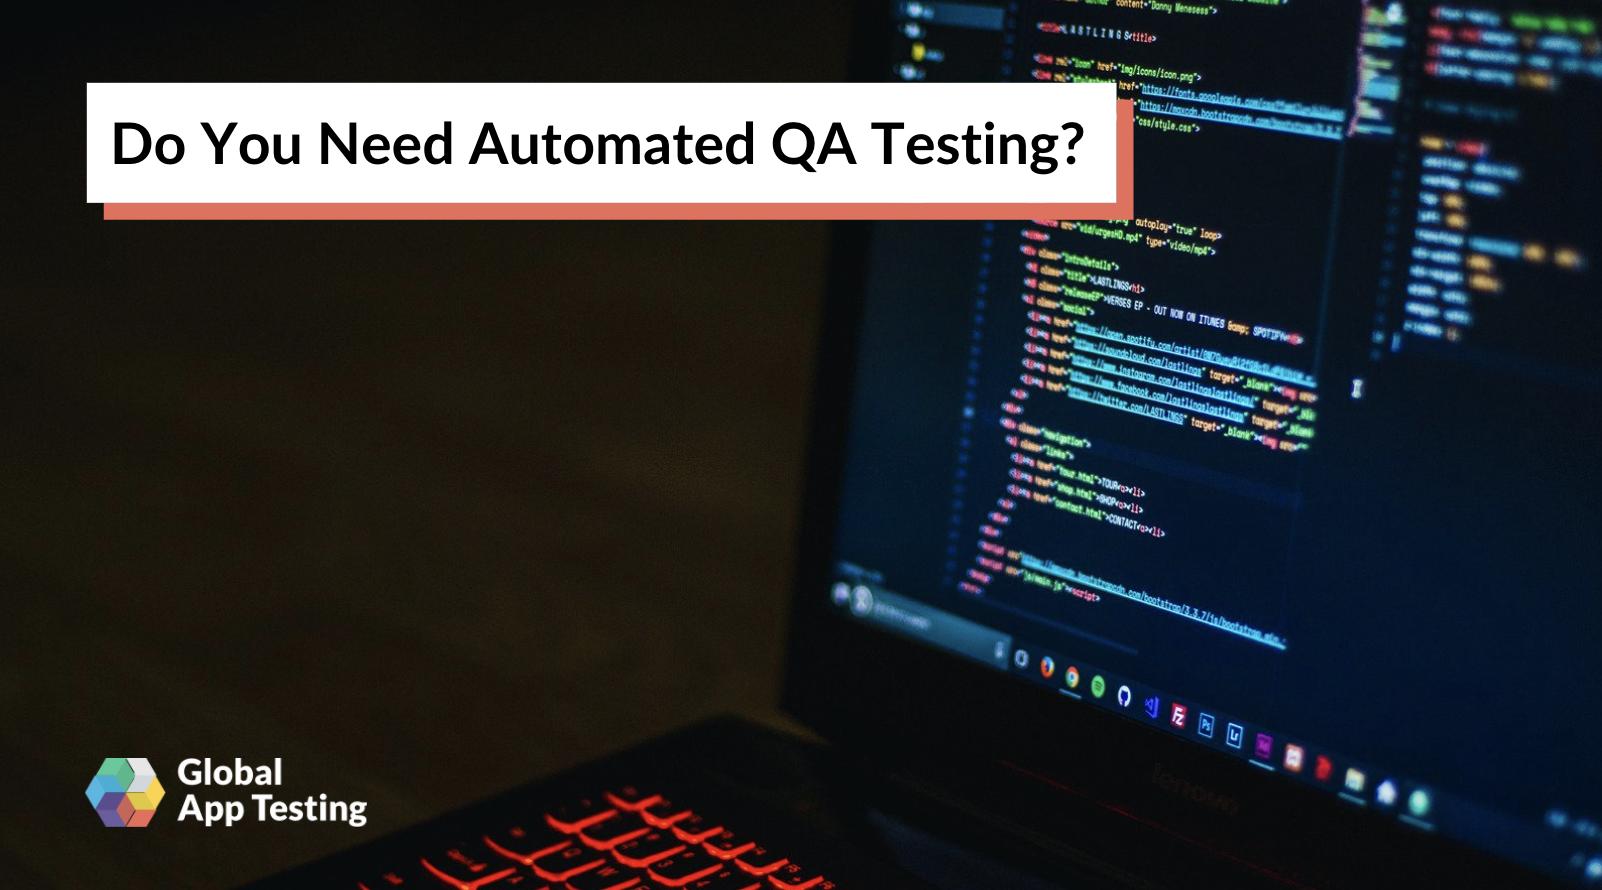 Automated QA Testing